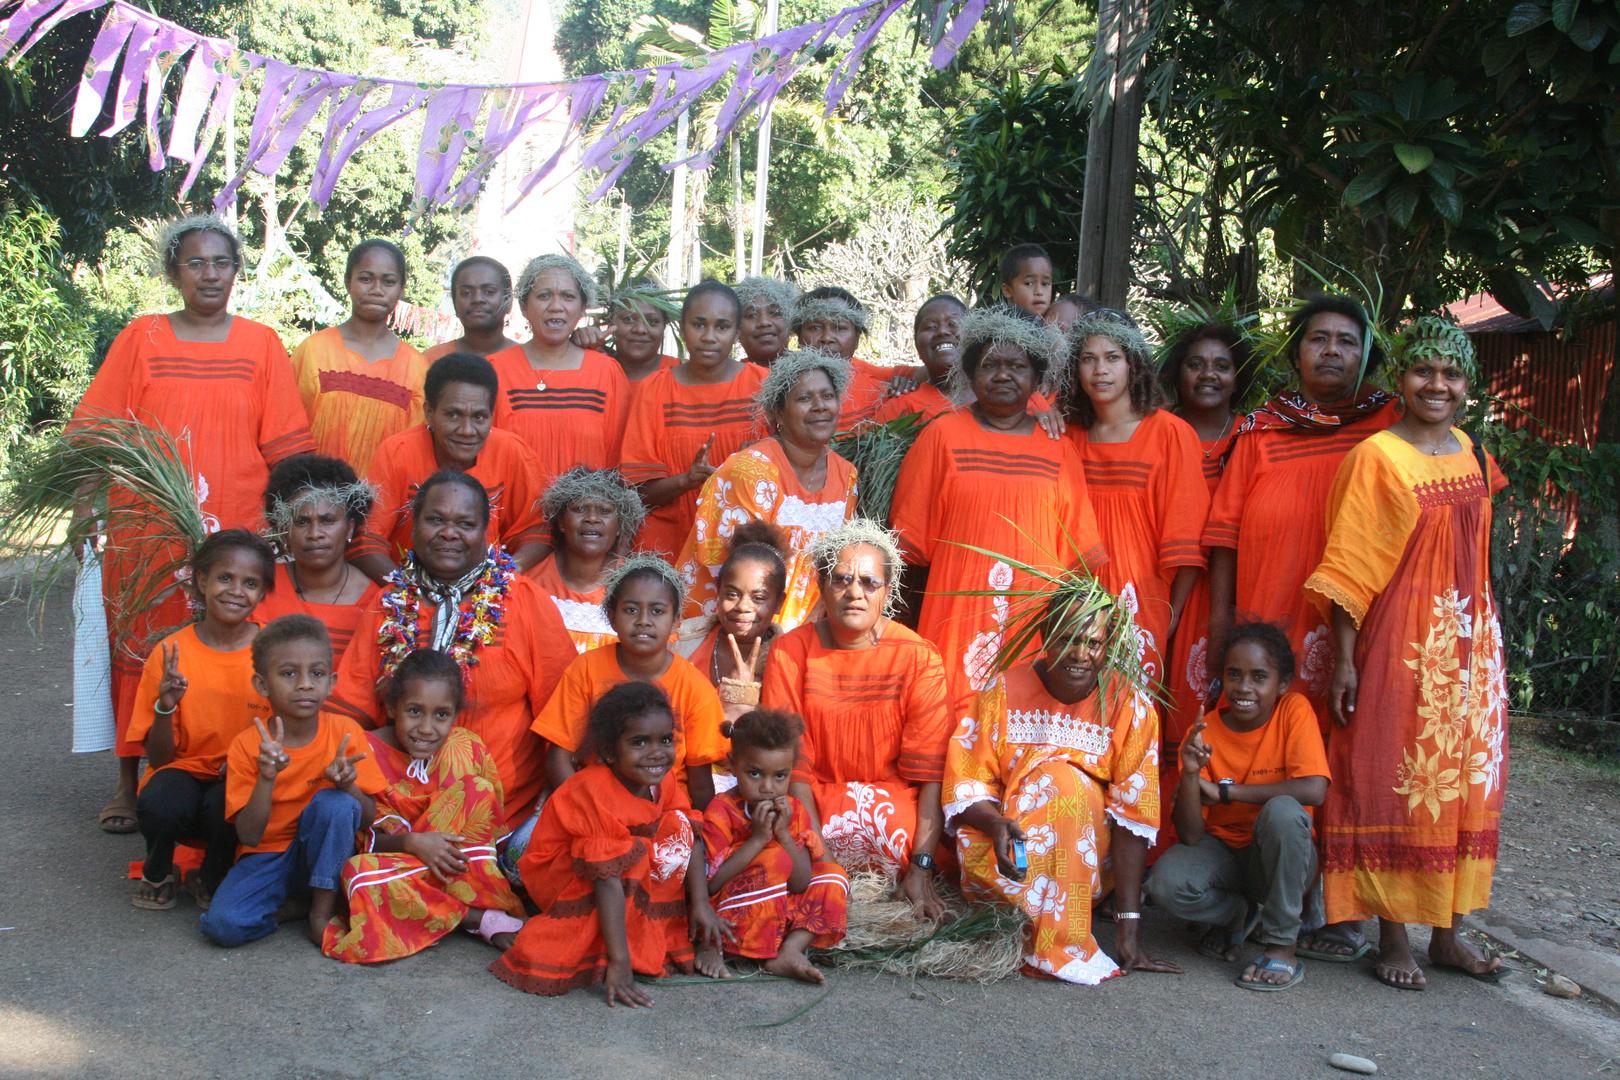 Femmes mélanésiennes